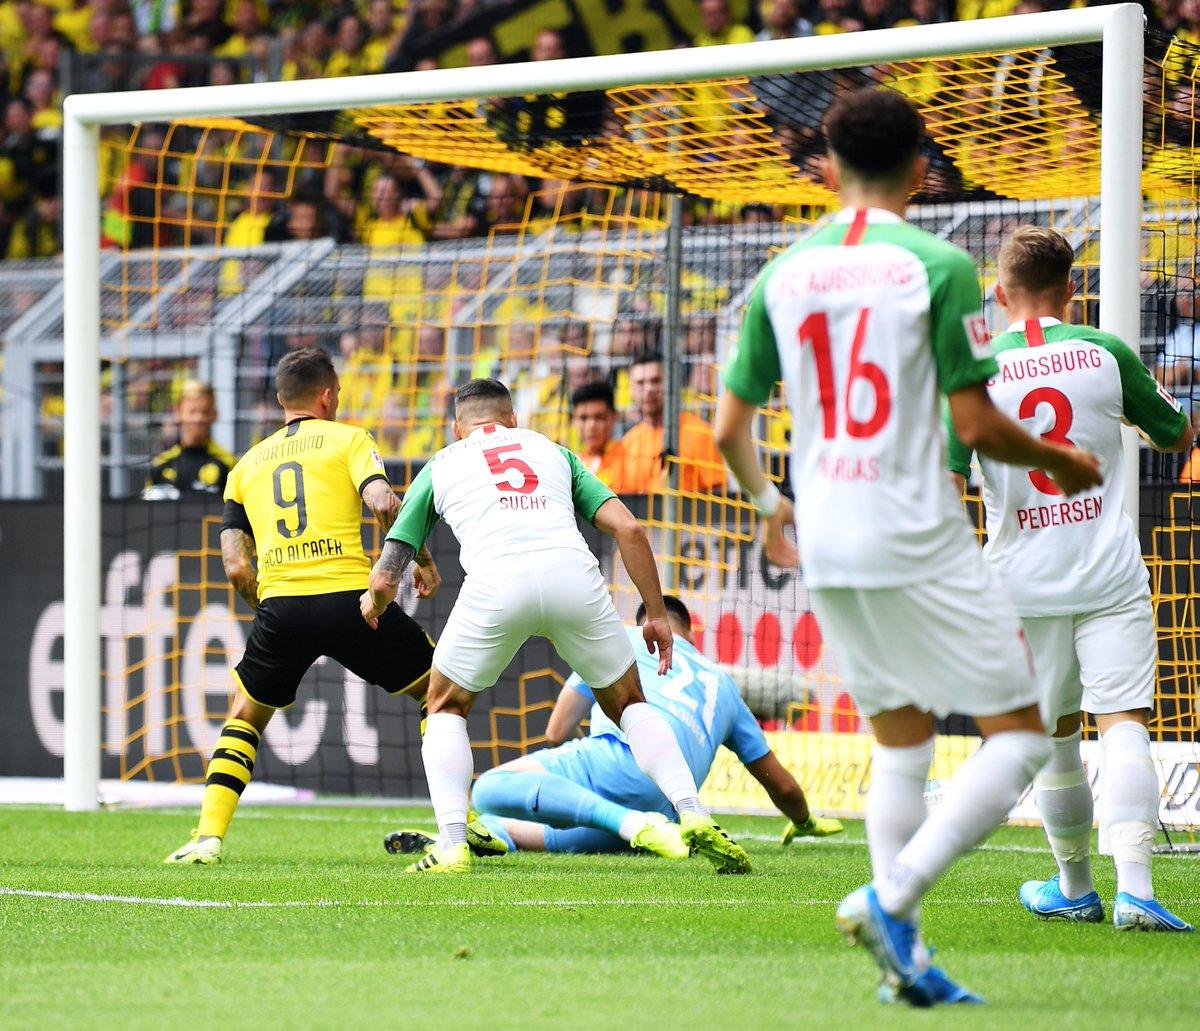 bundesliga-1-tur-borussiya-dortmund-augsburg-augsburg-17082019-posle-matcha